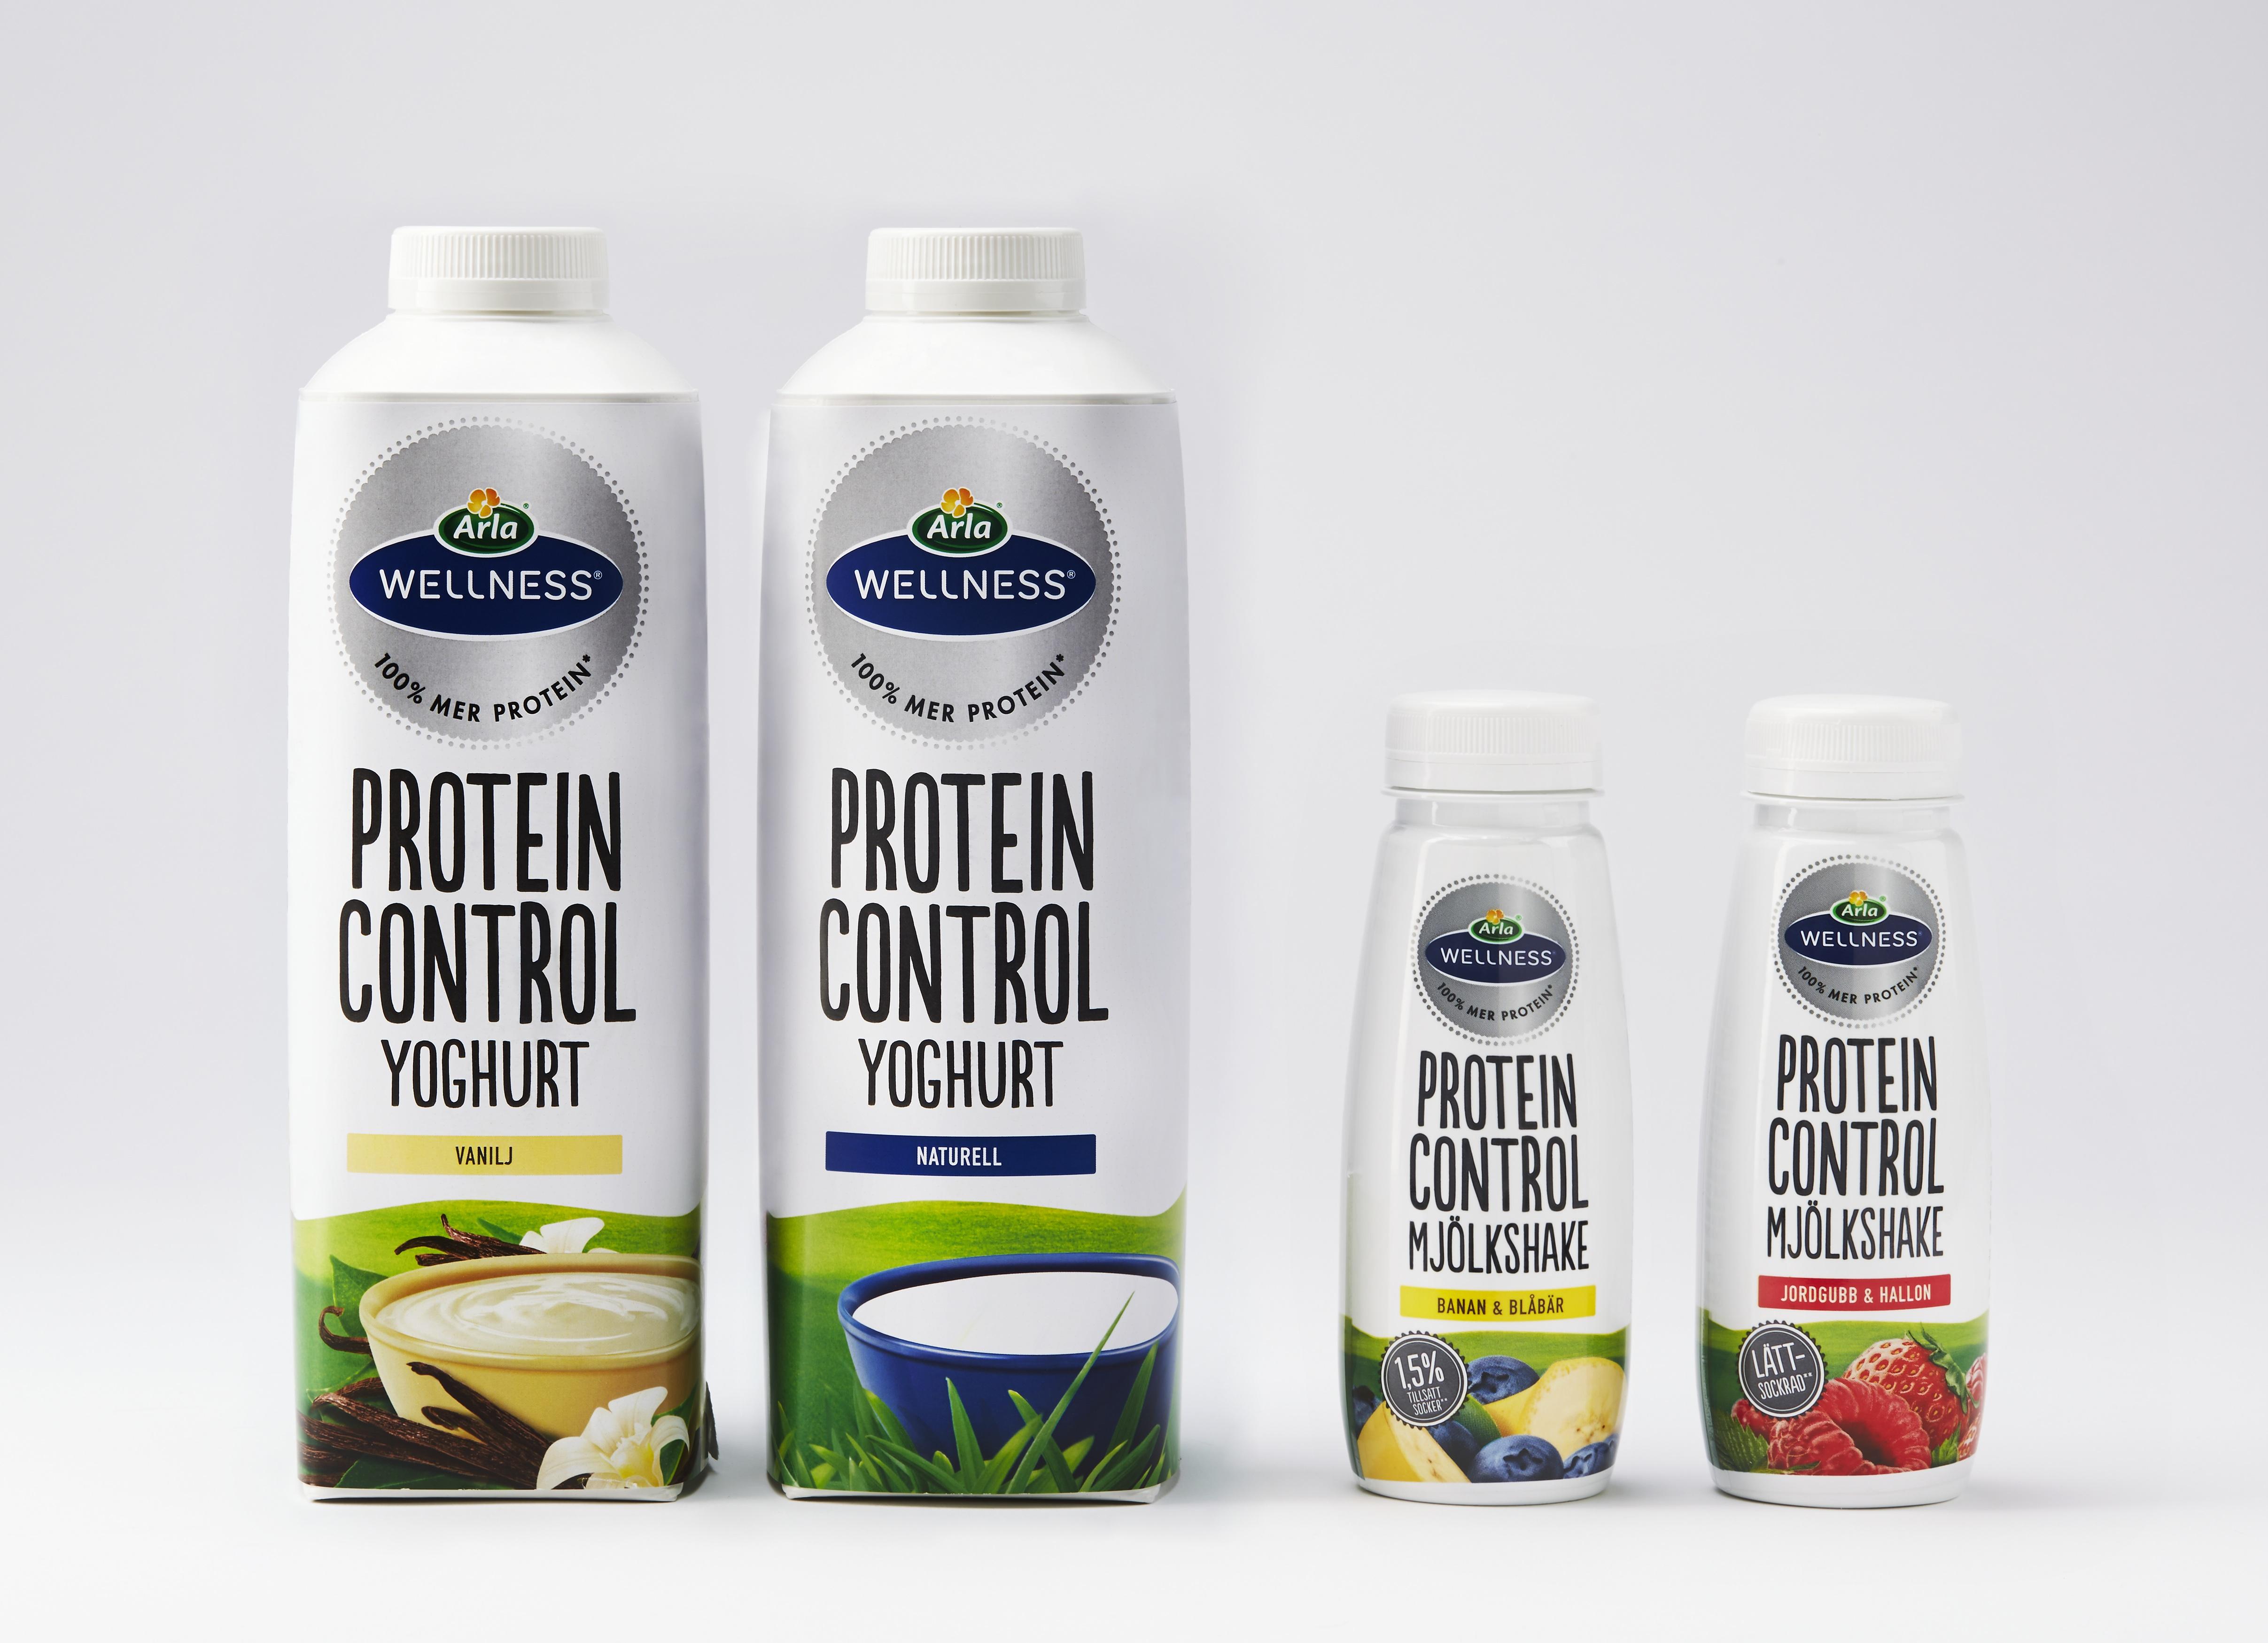 arla wellness protein control